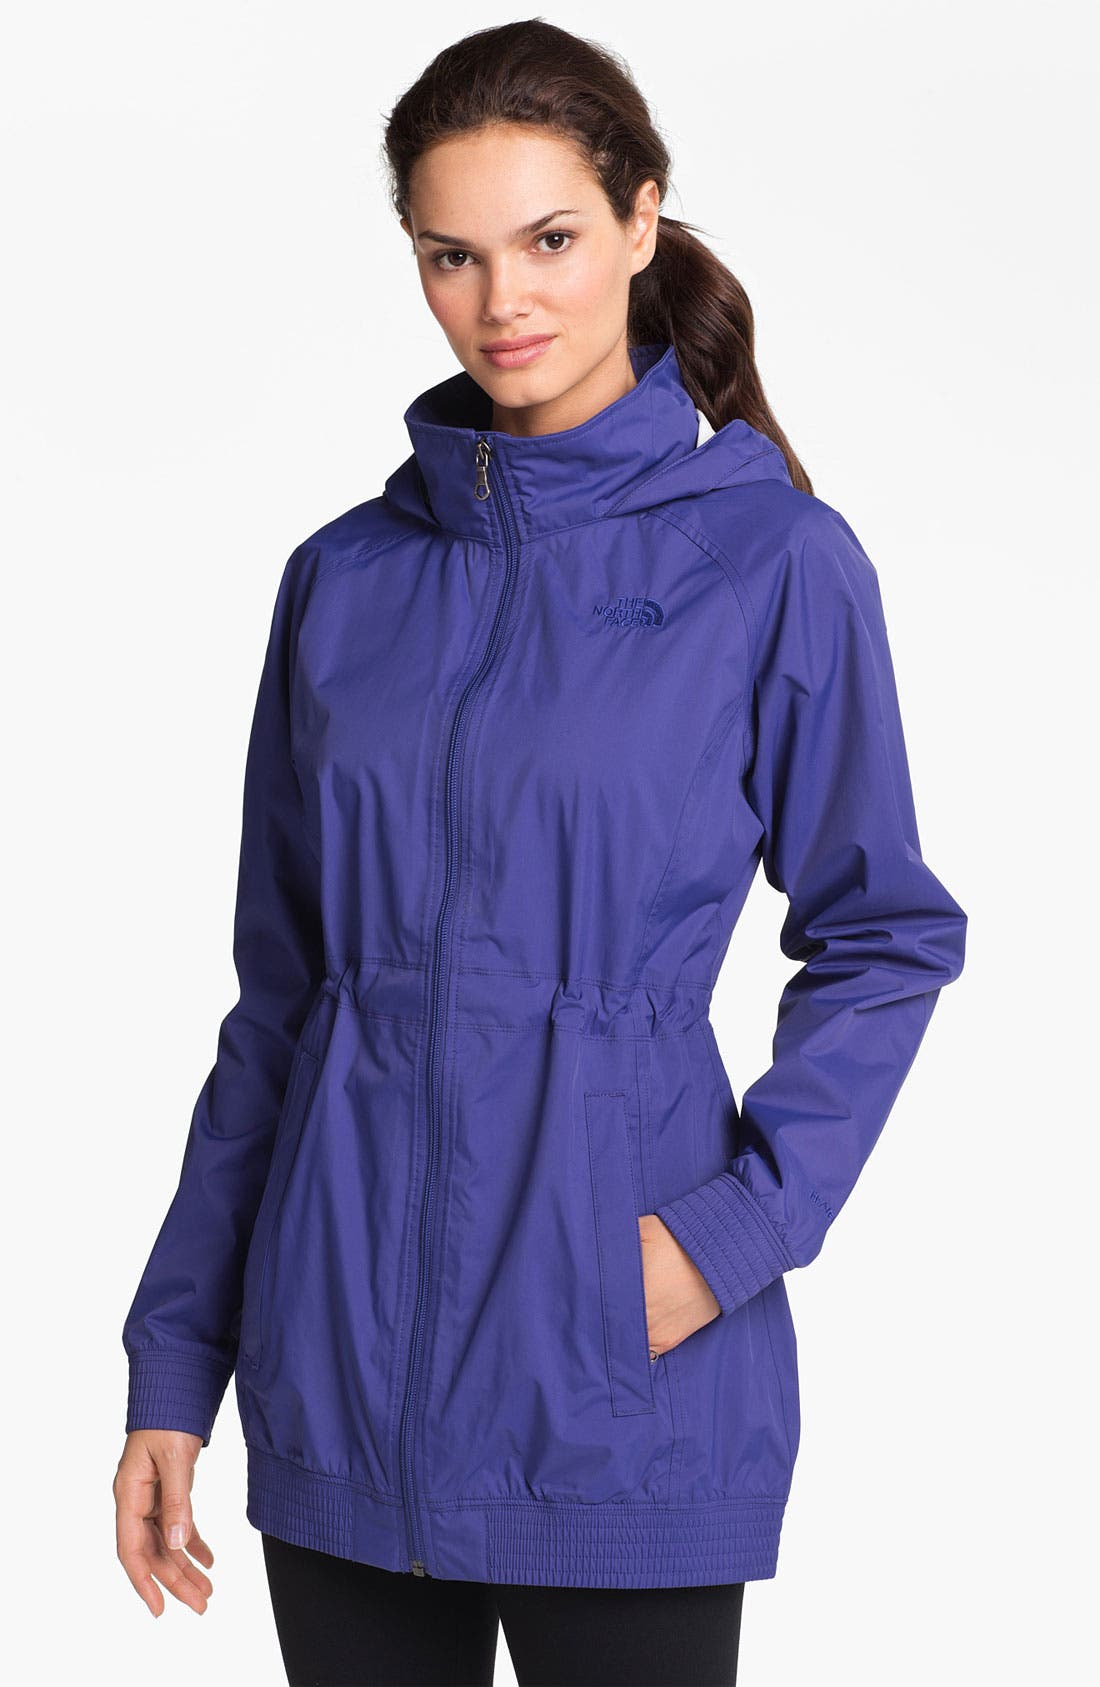 Main Image - The North Face 'Sereyna' Hooded Rain Jacket